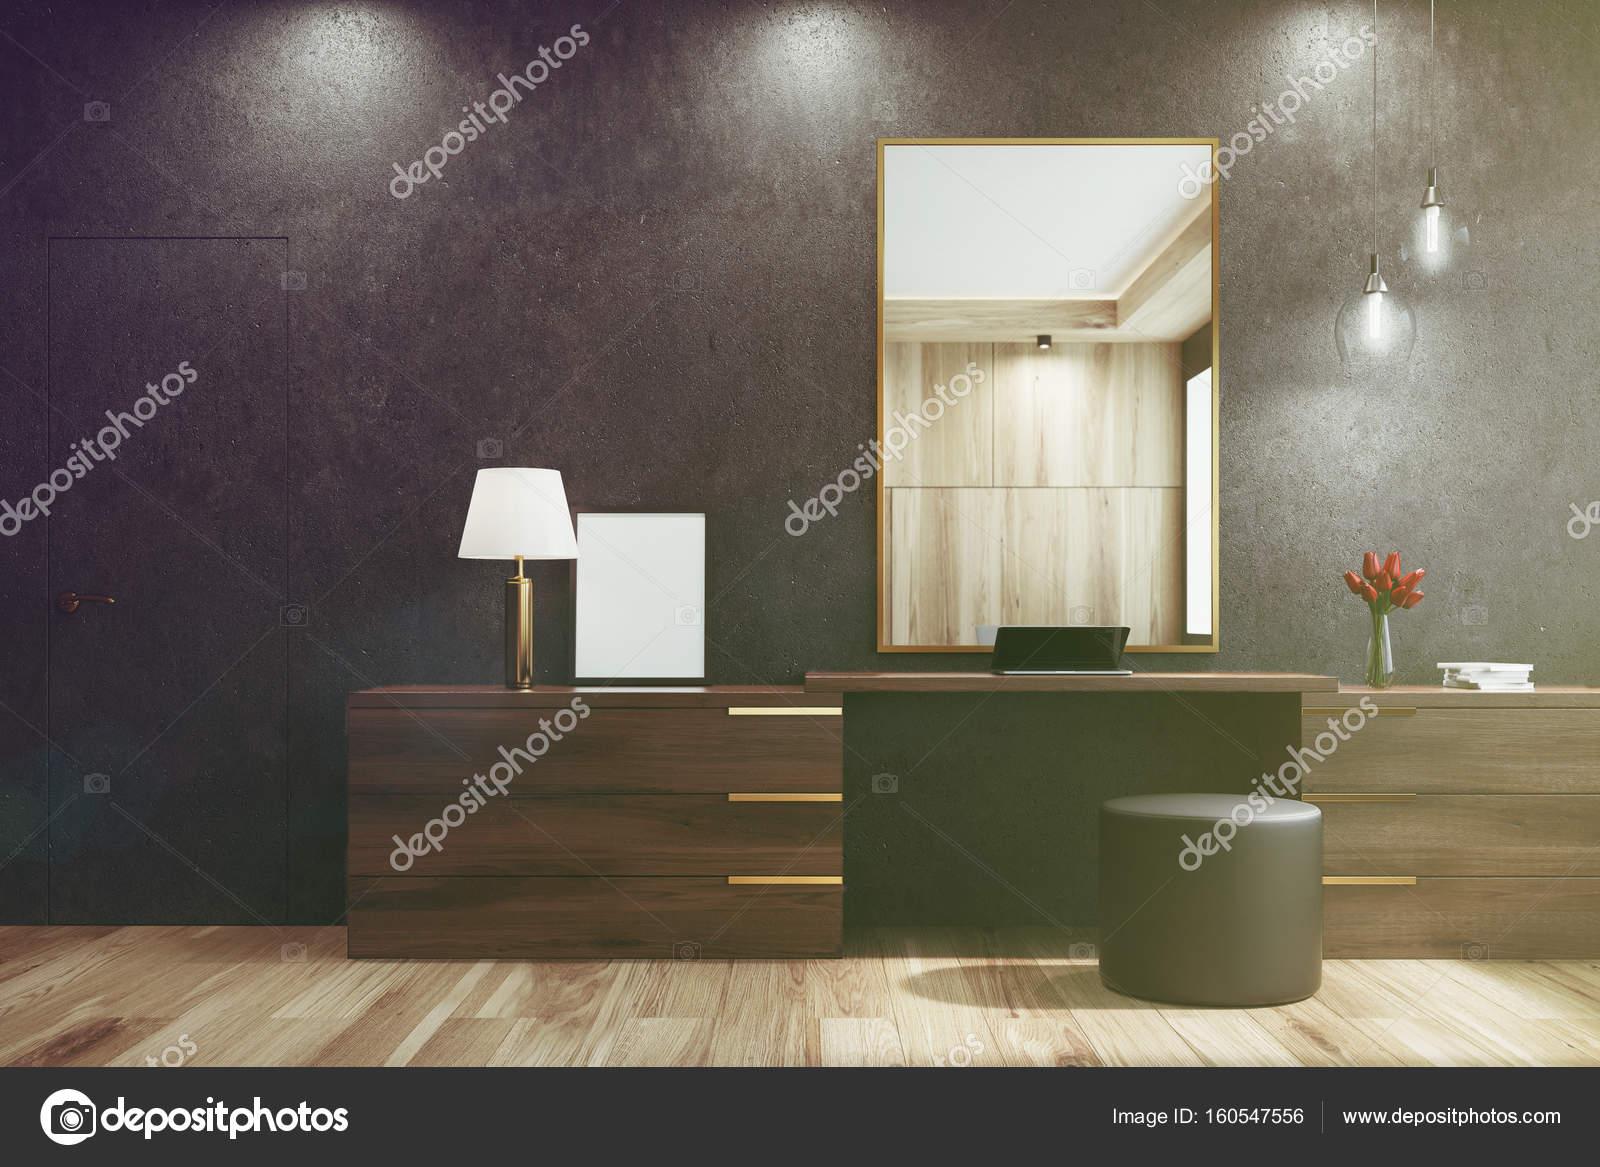 Ronde Zwarte Spiegel : Zwarte woonkamer met een spiegel afgezwakt u2014 stockfoto